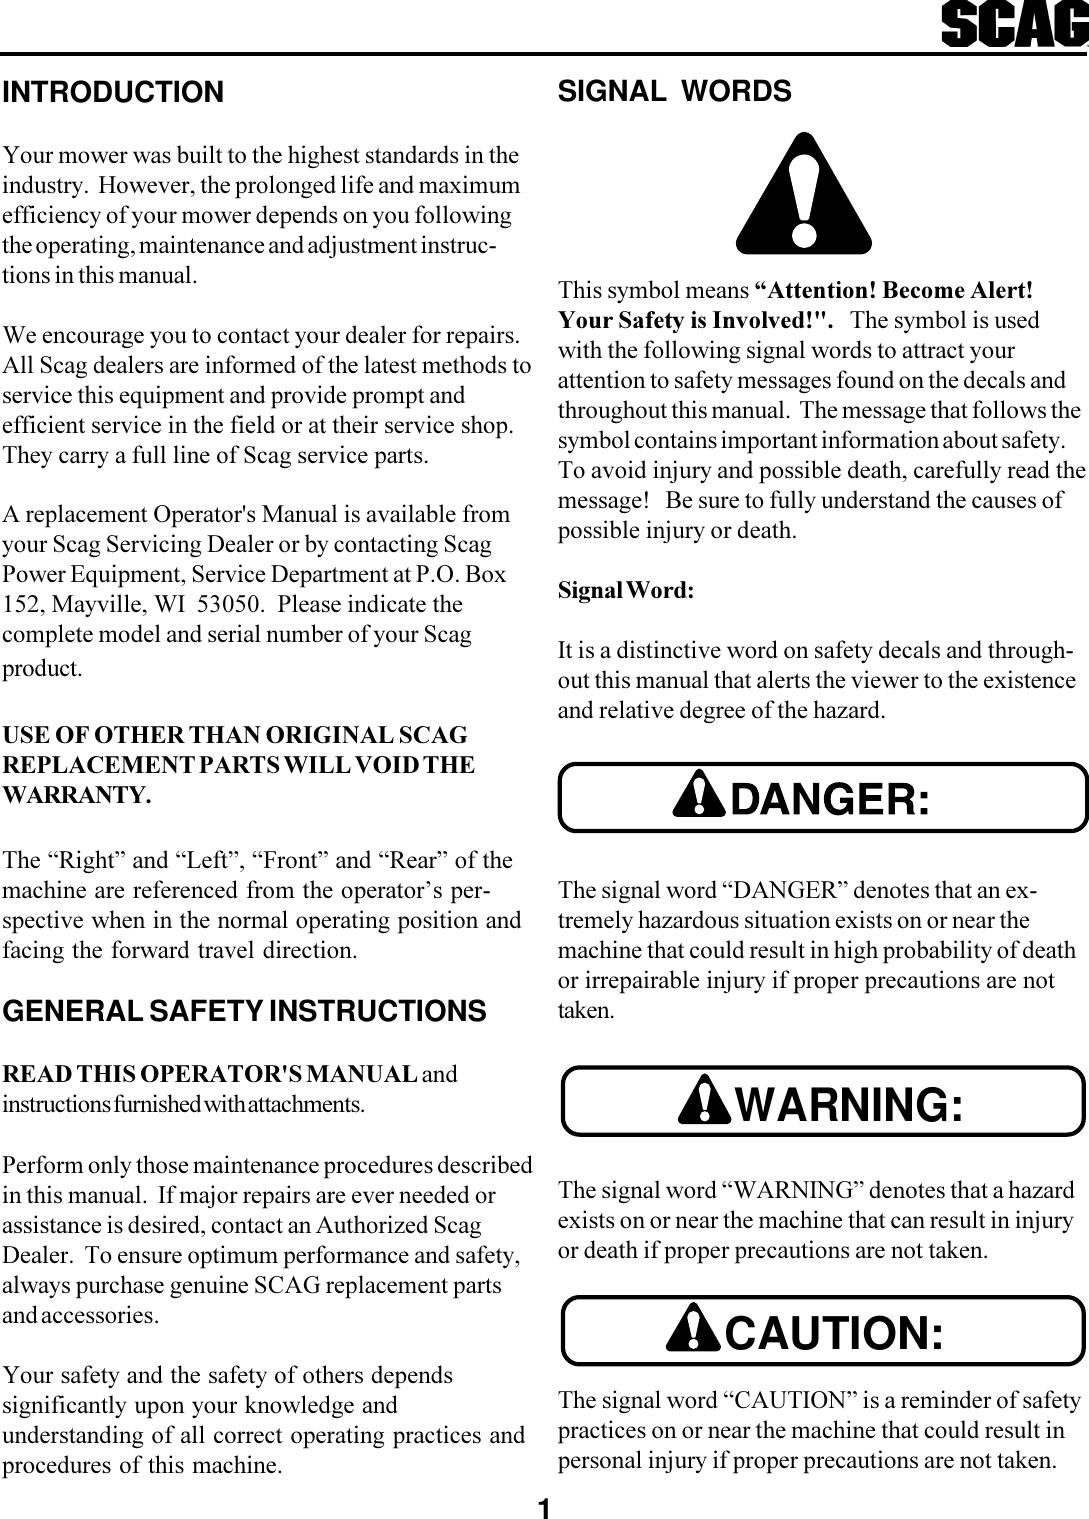 Scag Power Equipment Swu Users Manual